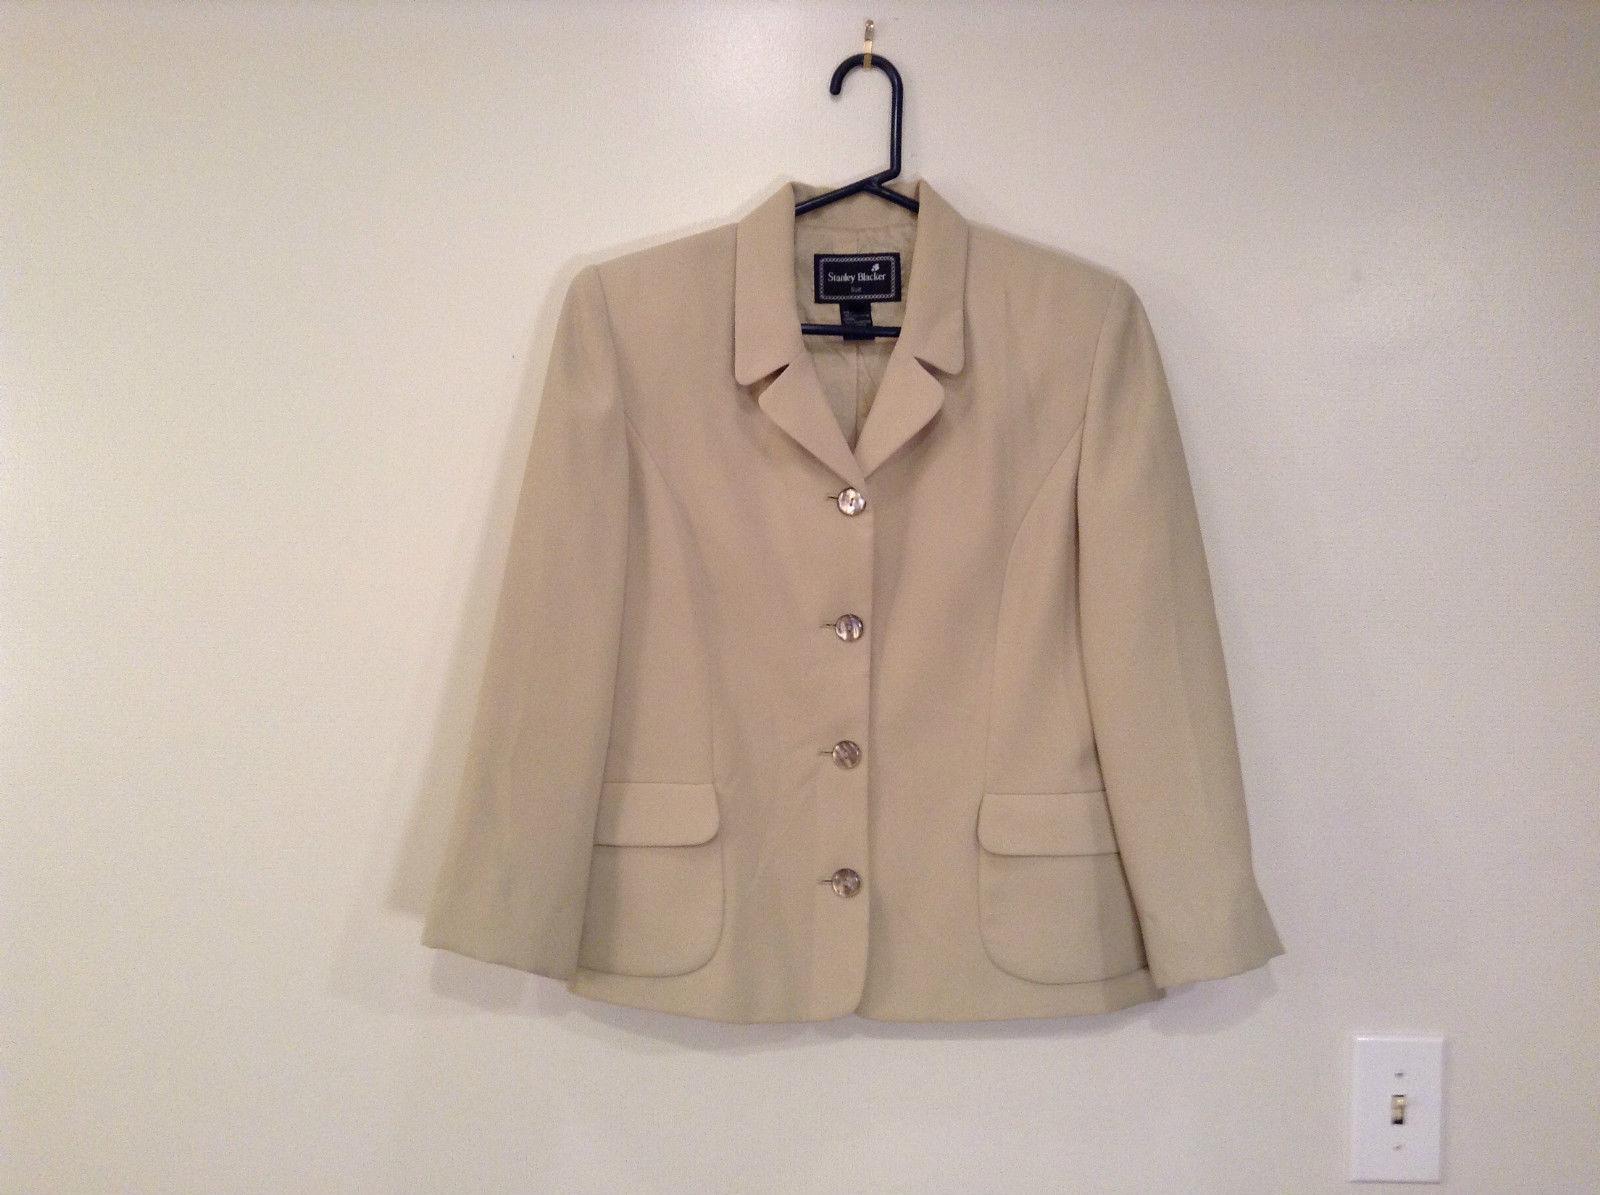 Light Green Stanley Blacker Suit Jacket Blazer Size 14P 4 Button Closure Pockets